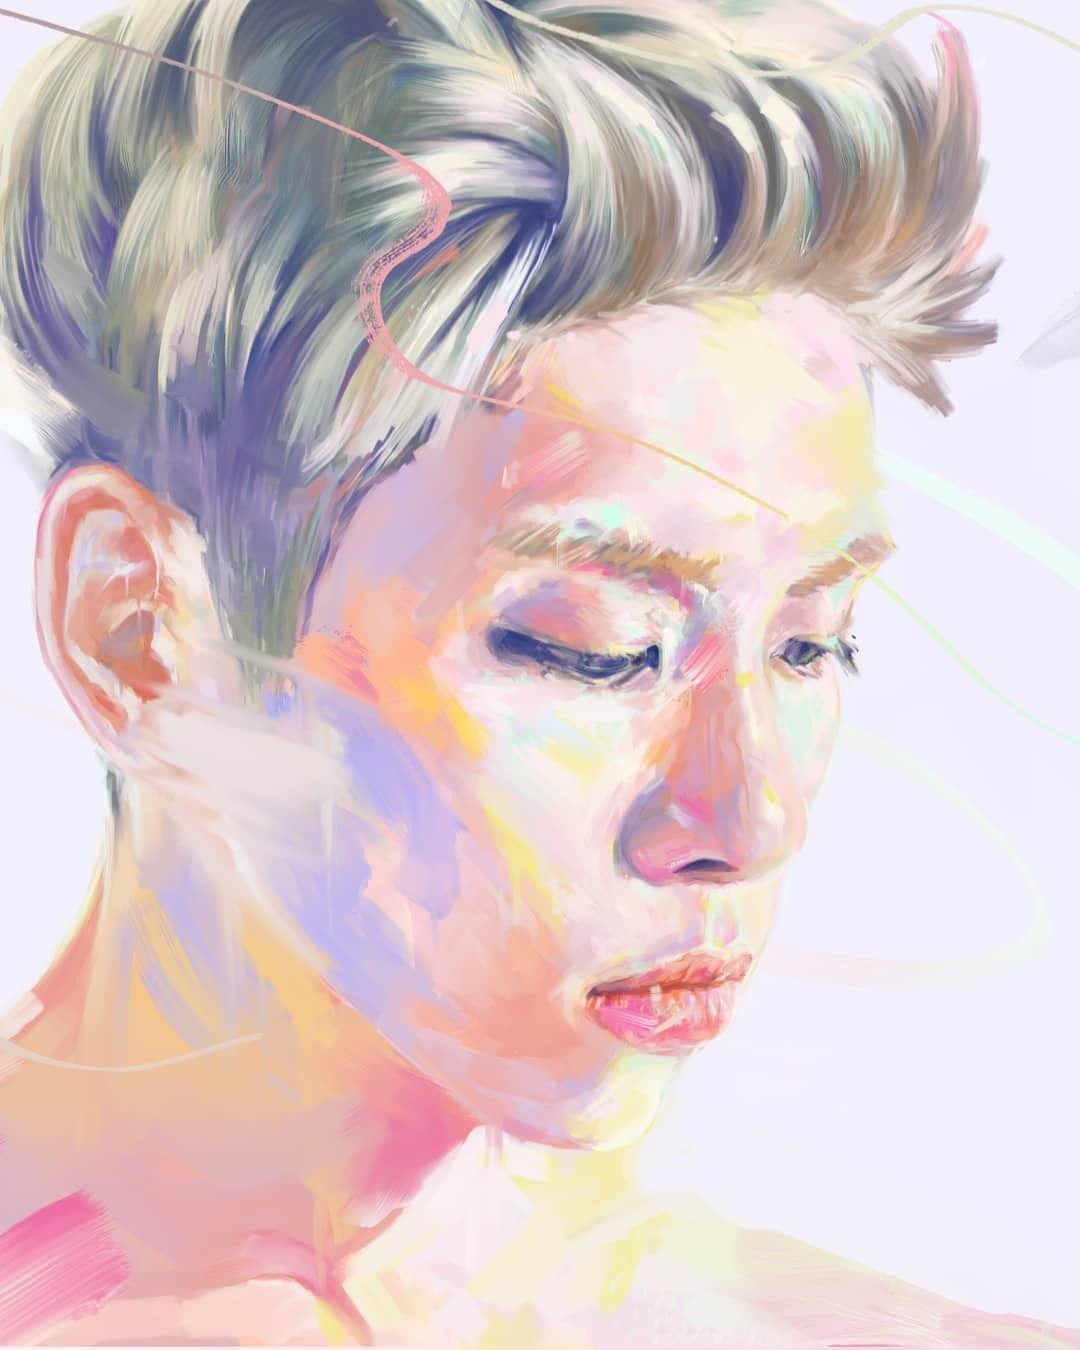 Translation Jonghyun The Collection Story Op 2 Spring Ver Work By 21cat Jonghyun Shinee Kpop Fanart